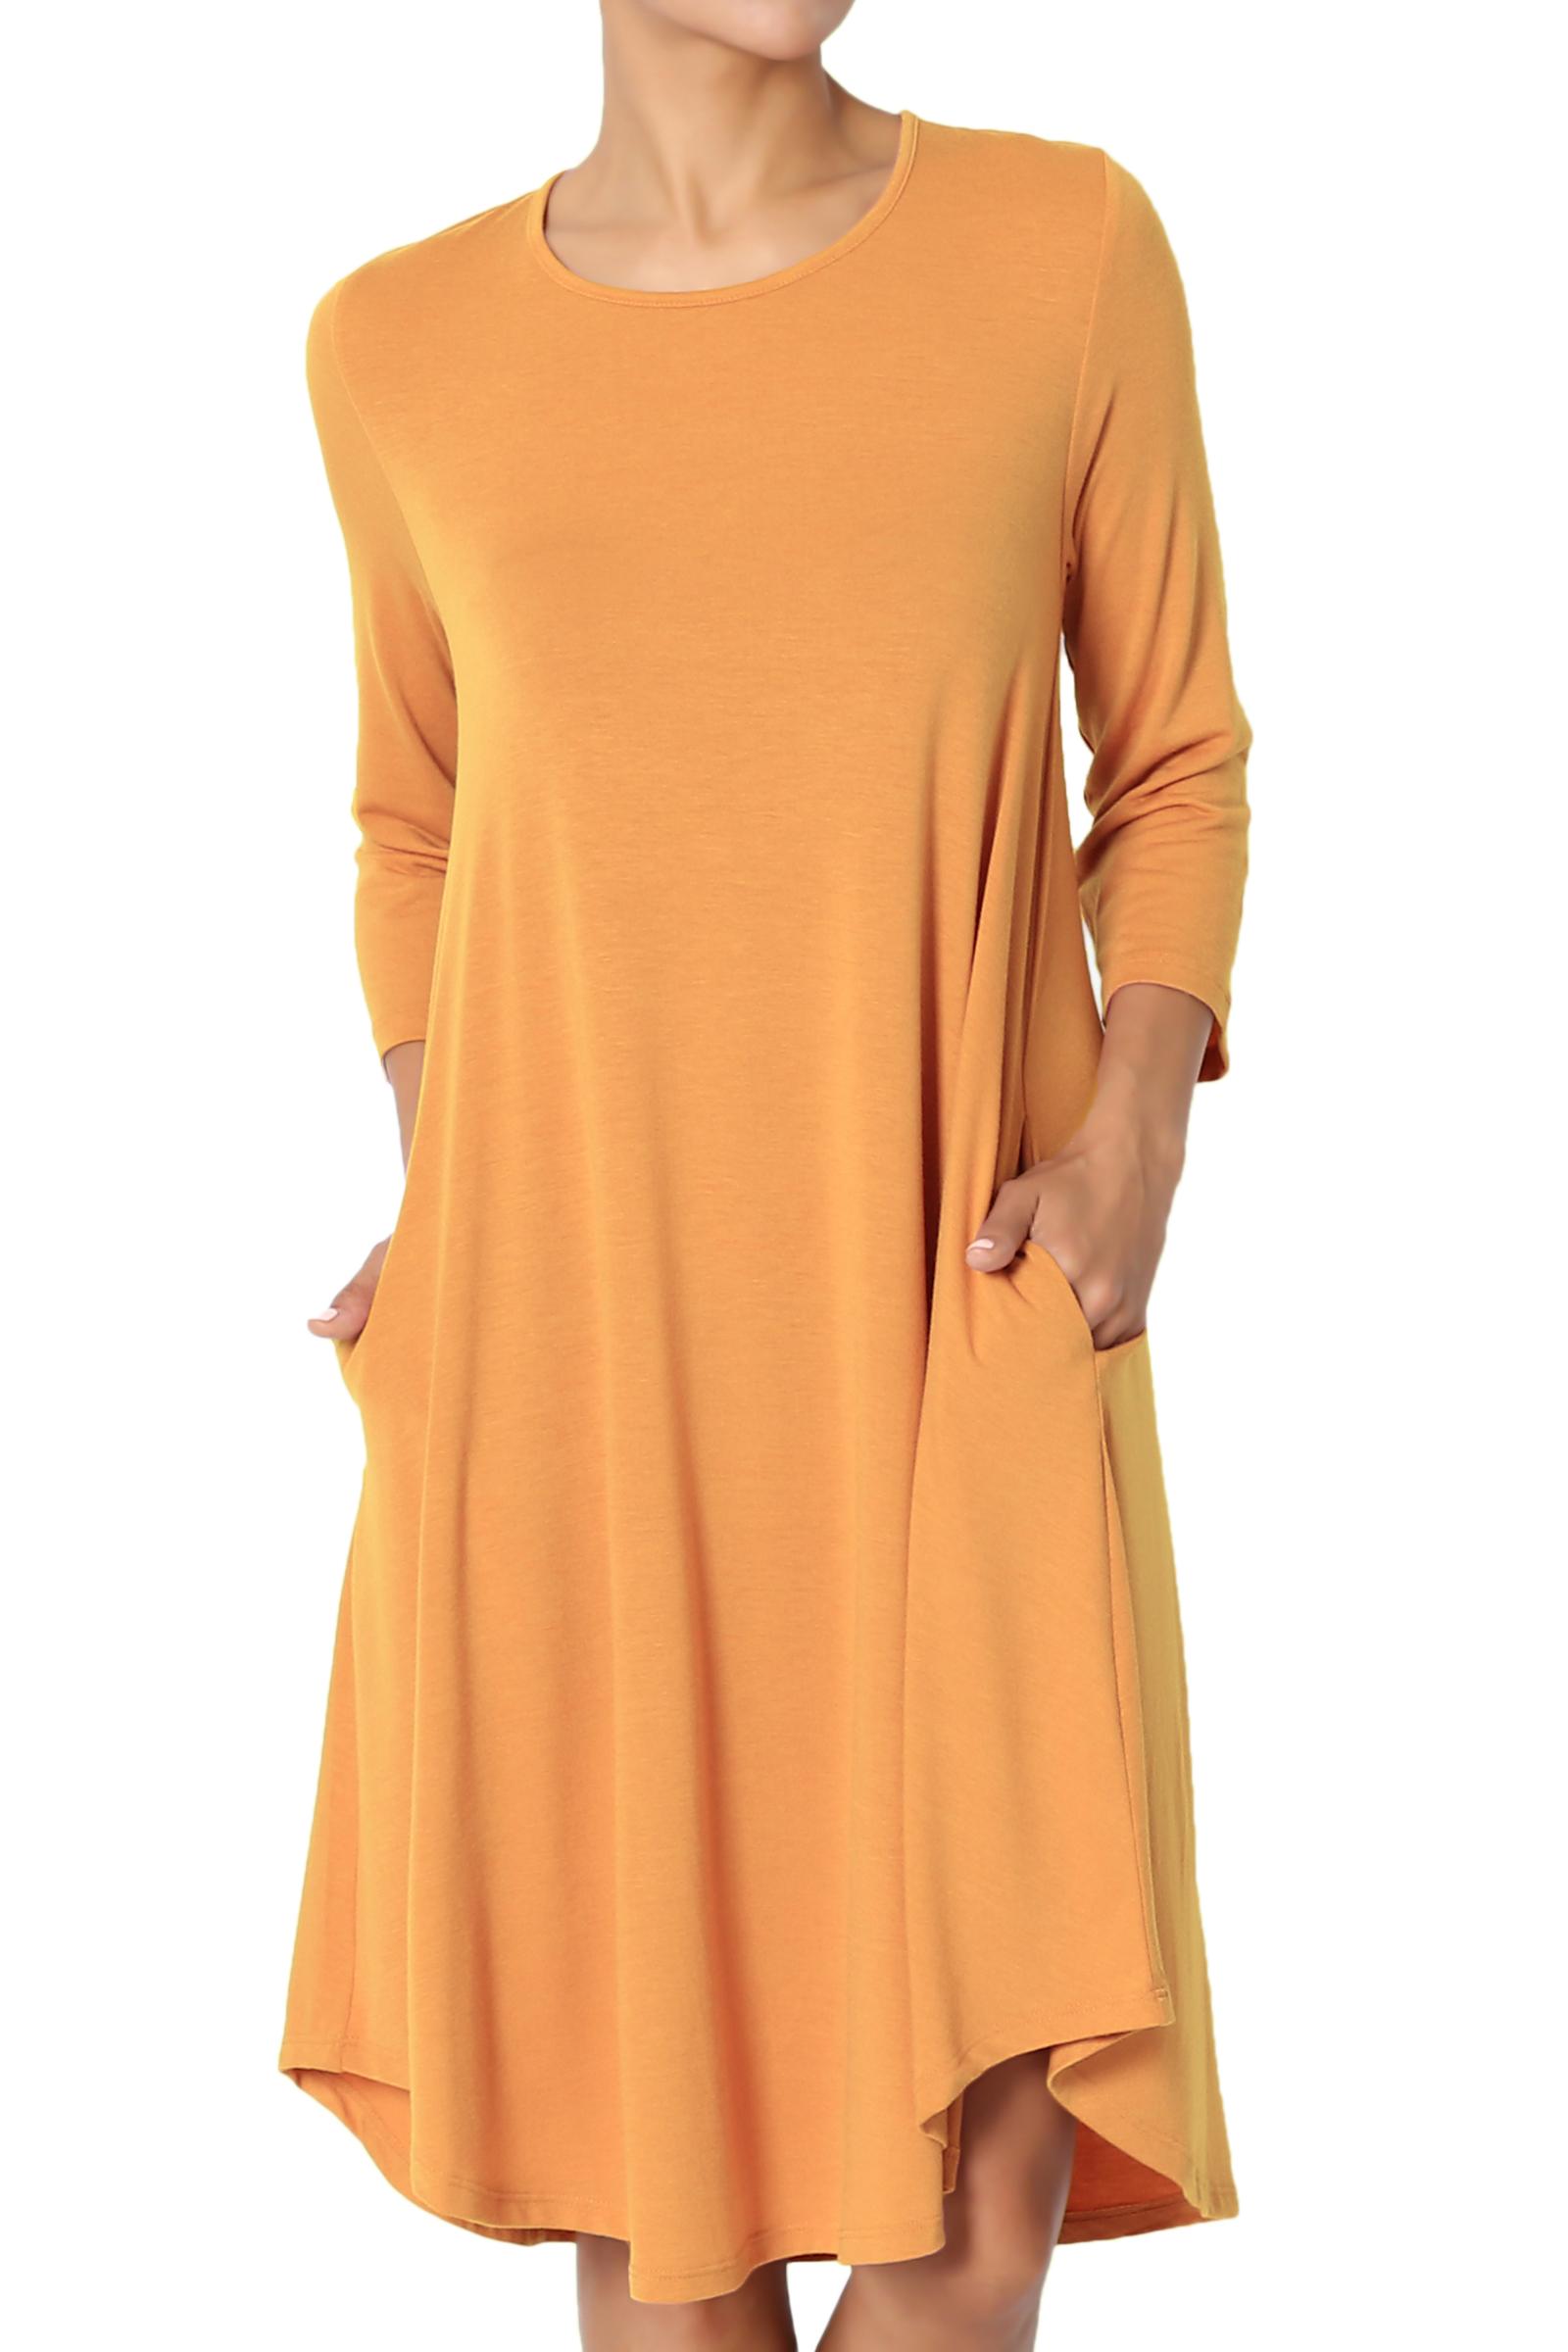 TheMogan Women's PLUS 3/4 Sleeve A-Line Flared Jersey Knit Pocket T-Shirt Dress